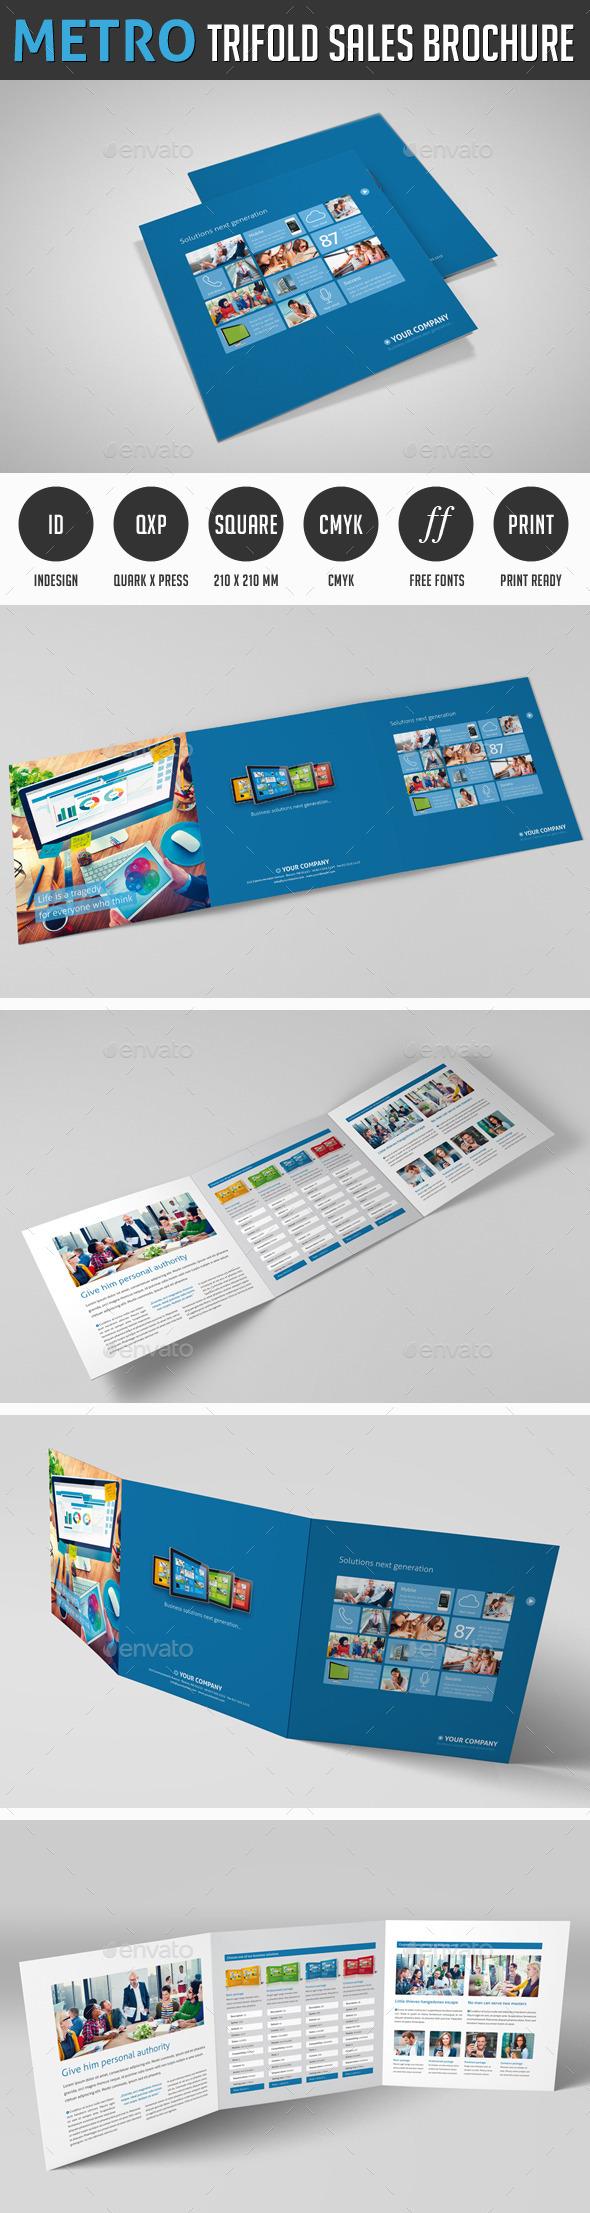 Metro Tri-fold Sales Brochure - Corporate Brochures